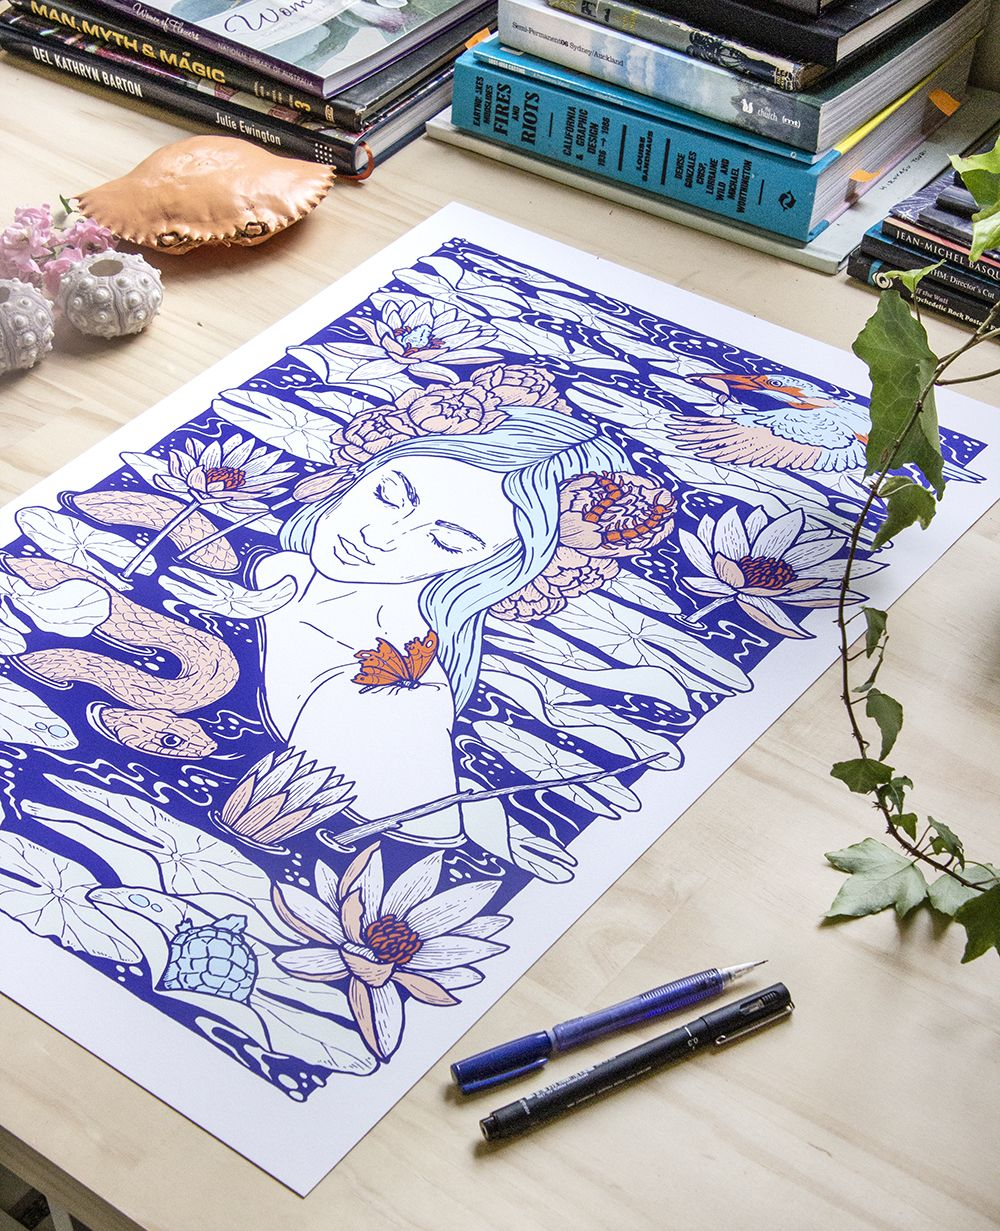 Wade Artwork Print In Raychponygold Studio Illustration Drawing Art Woman Feminine Water River Snake Ophel Art Sketchbook Sketch Book Art Drawings